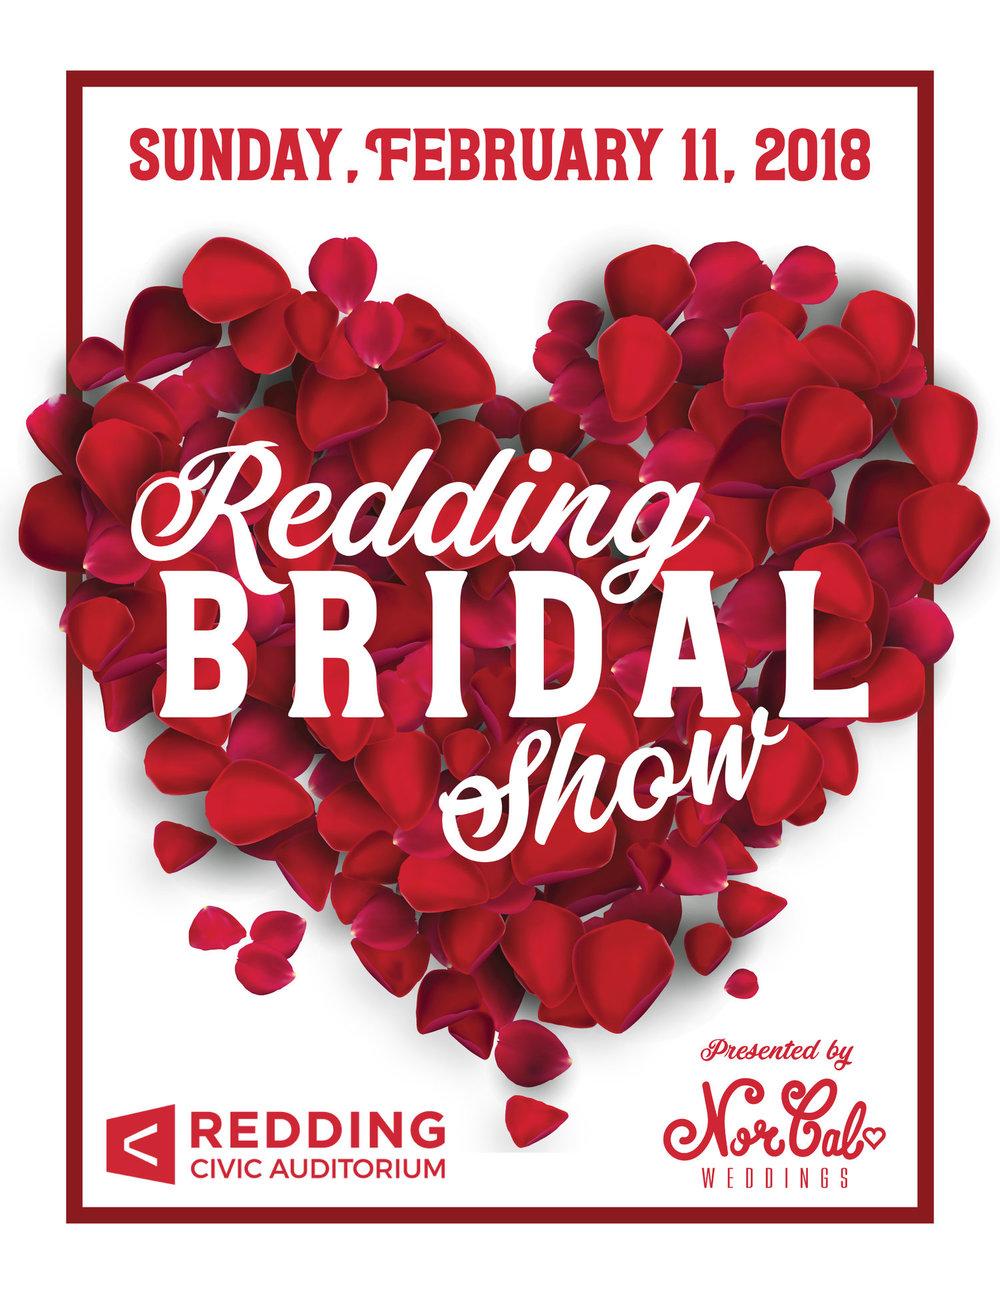 Redding+Bridal+Show (1).jpg